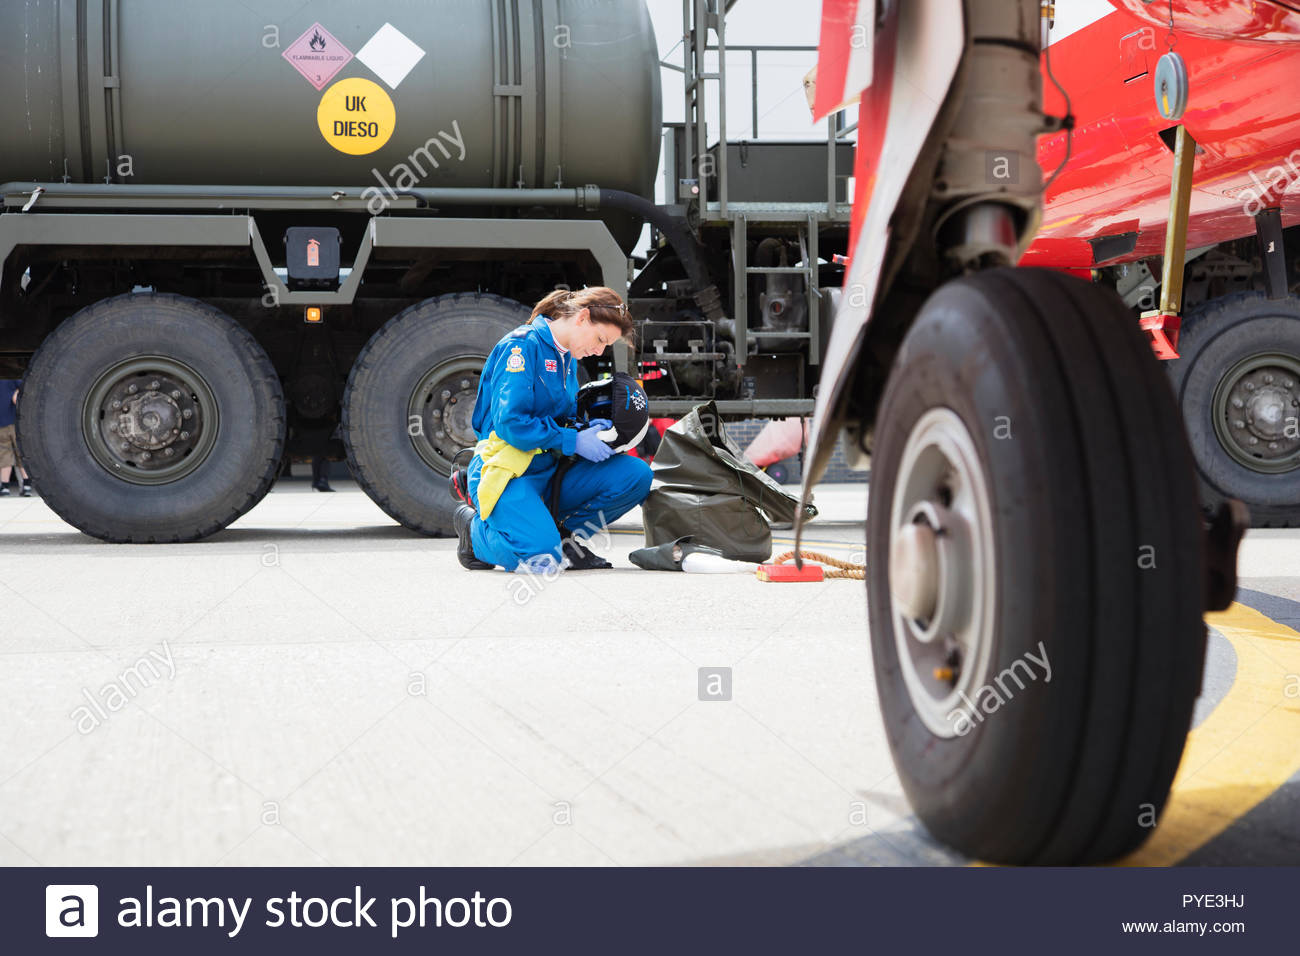 Crouched Red Arrows pilot holding helmet on RAF Scrampton, UK - Stock Image